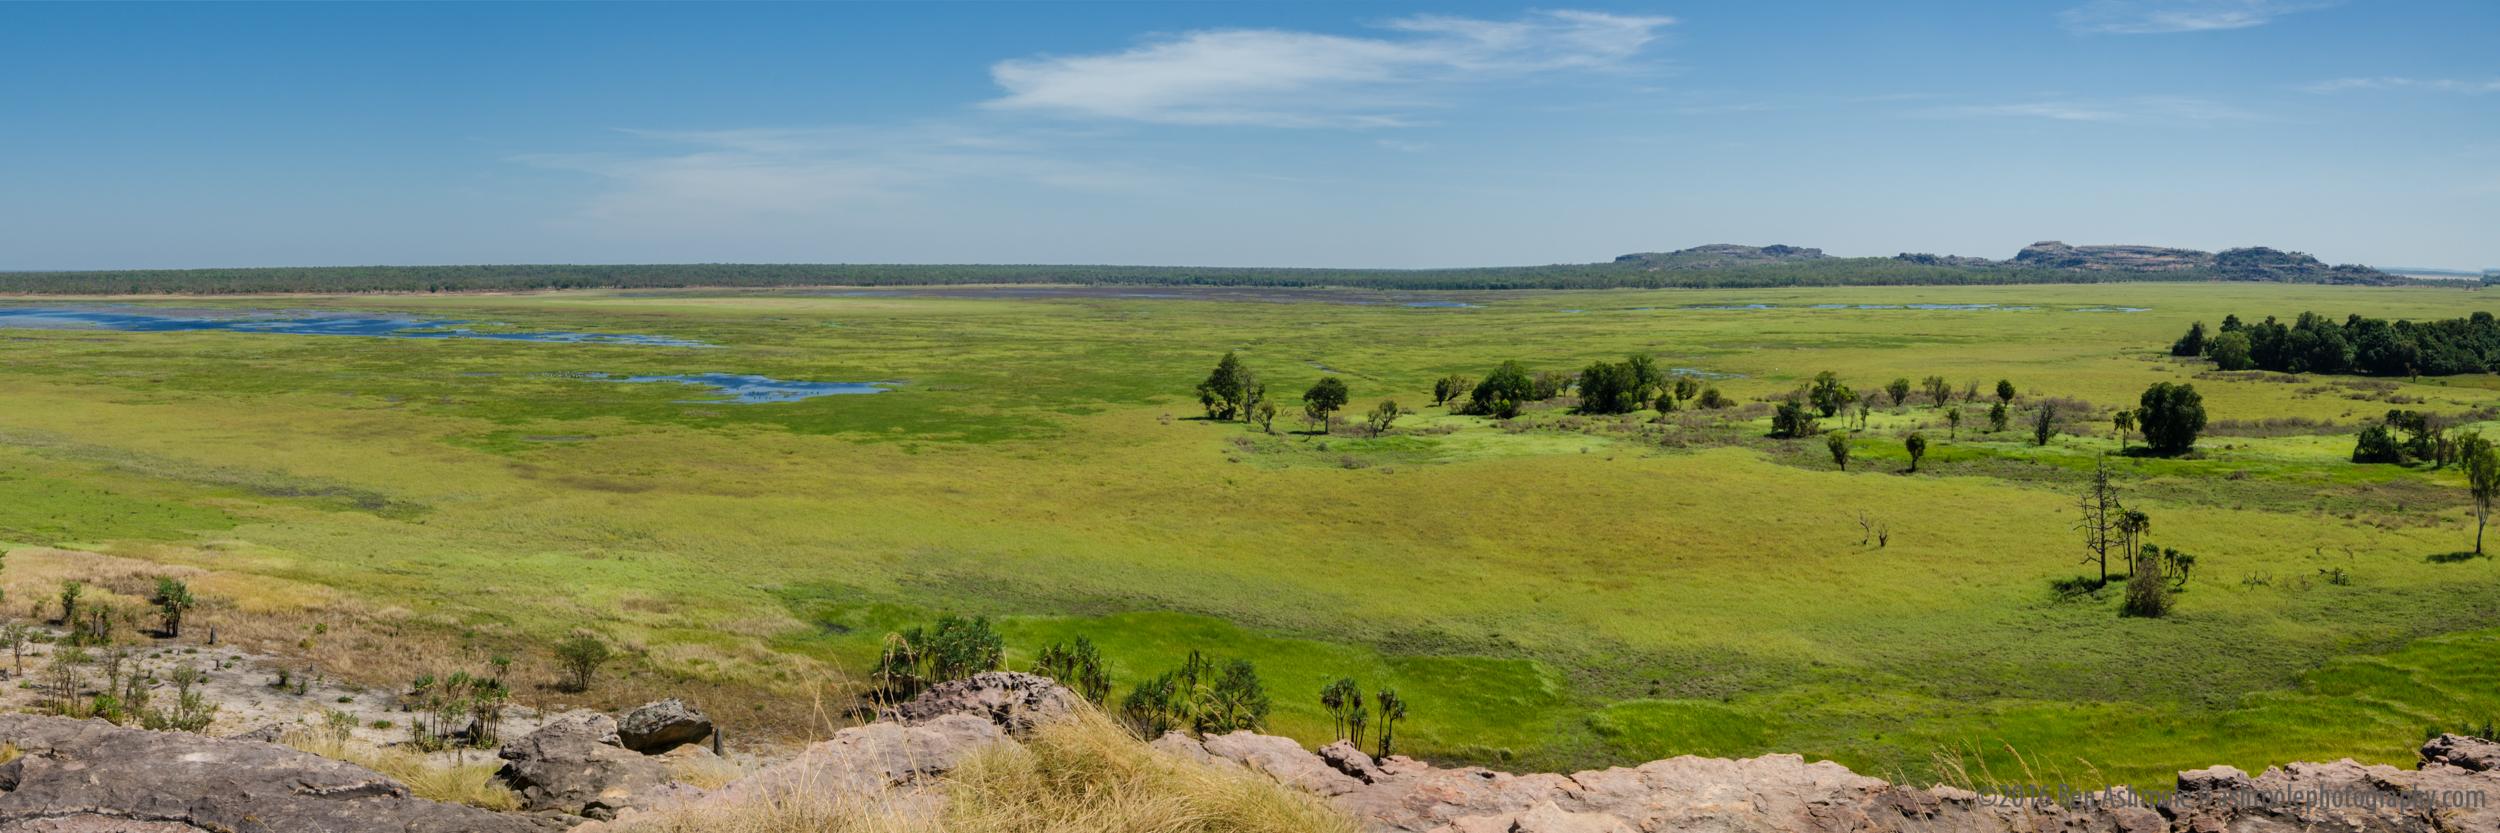 Floodplain Panorama, Ubirr, Kakadu National Park, NT, Australia